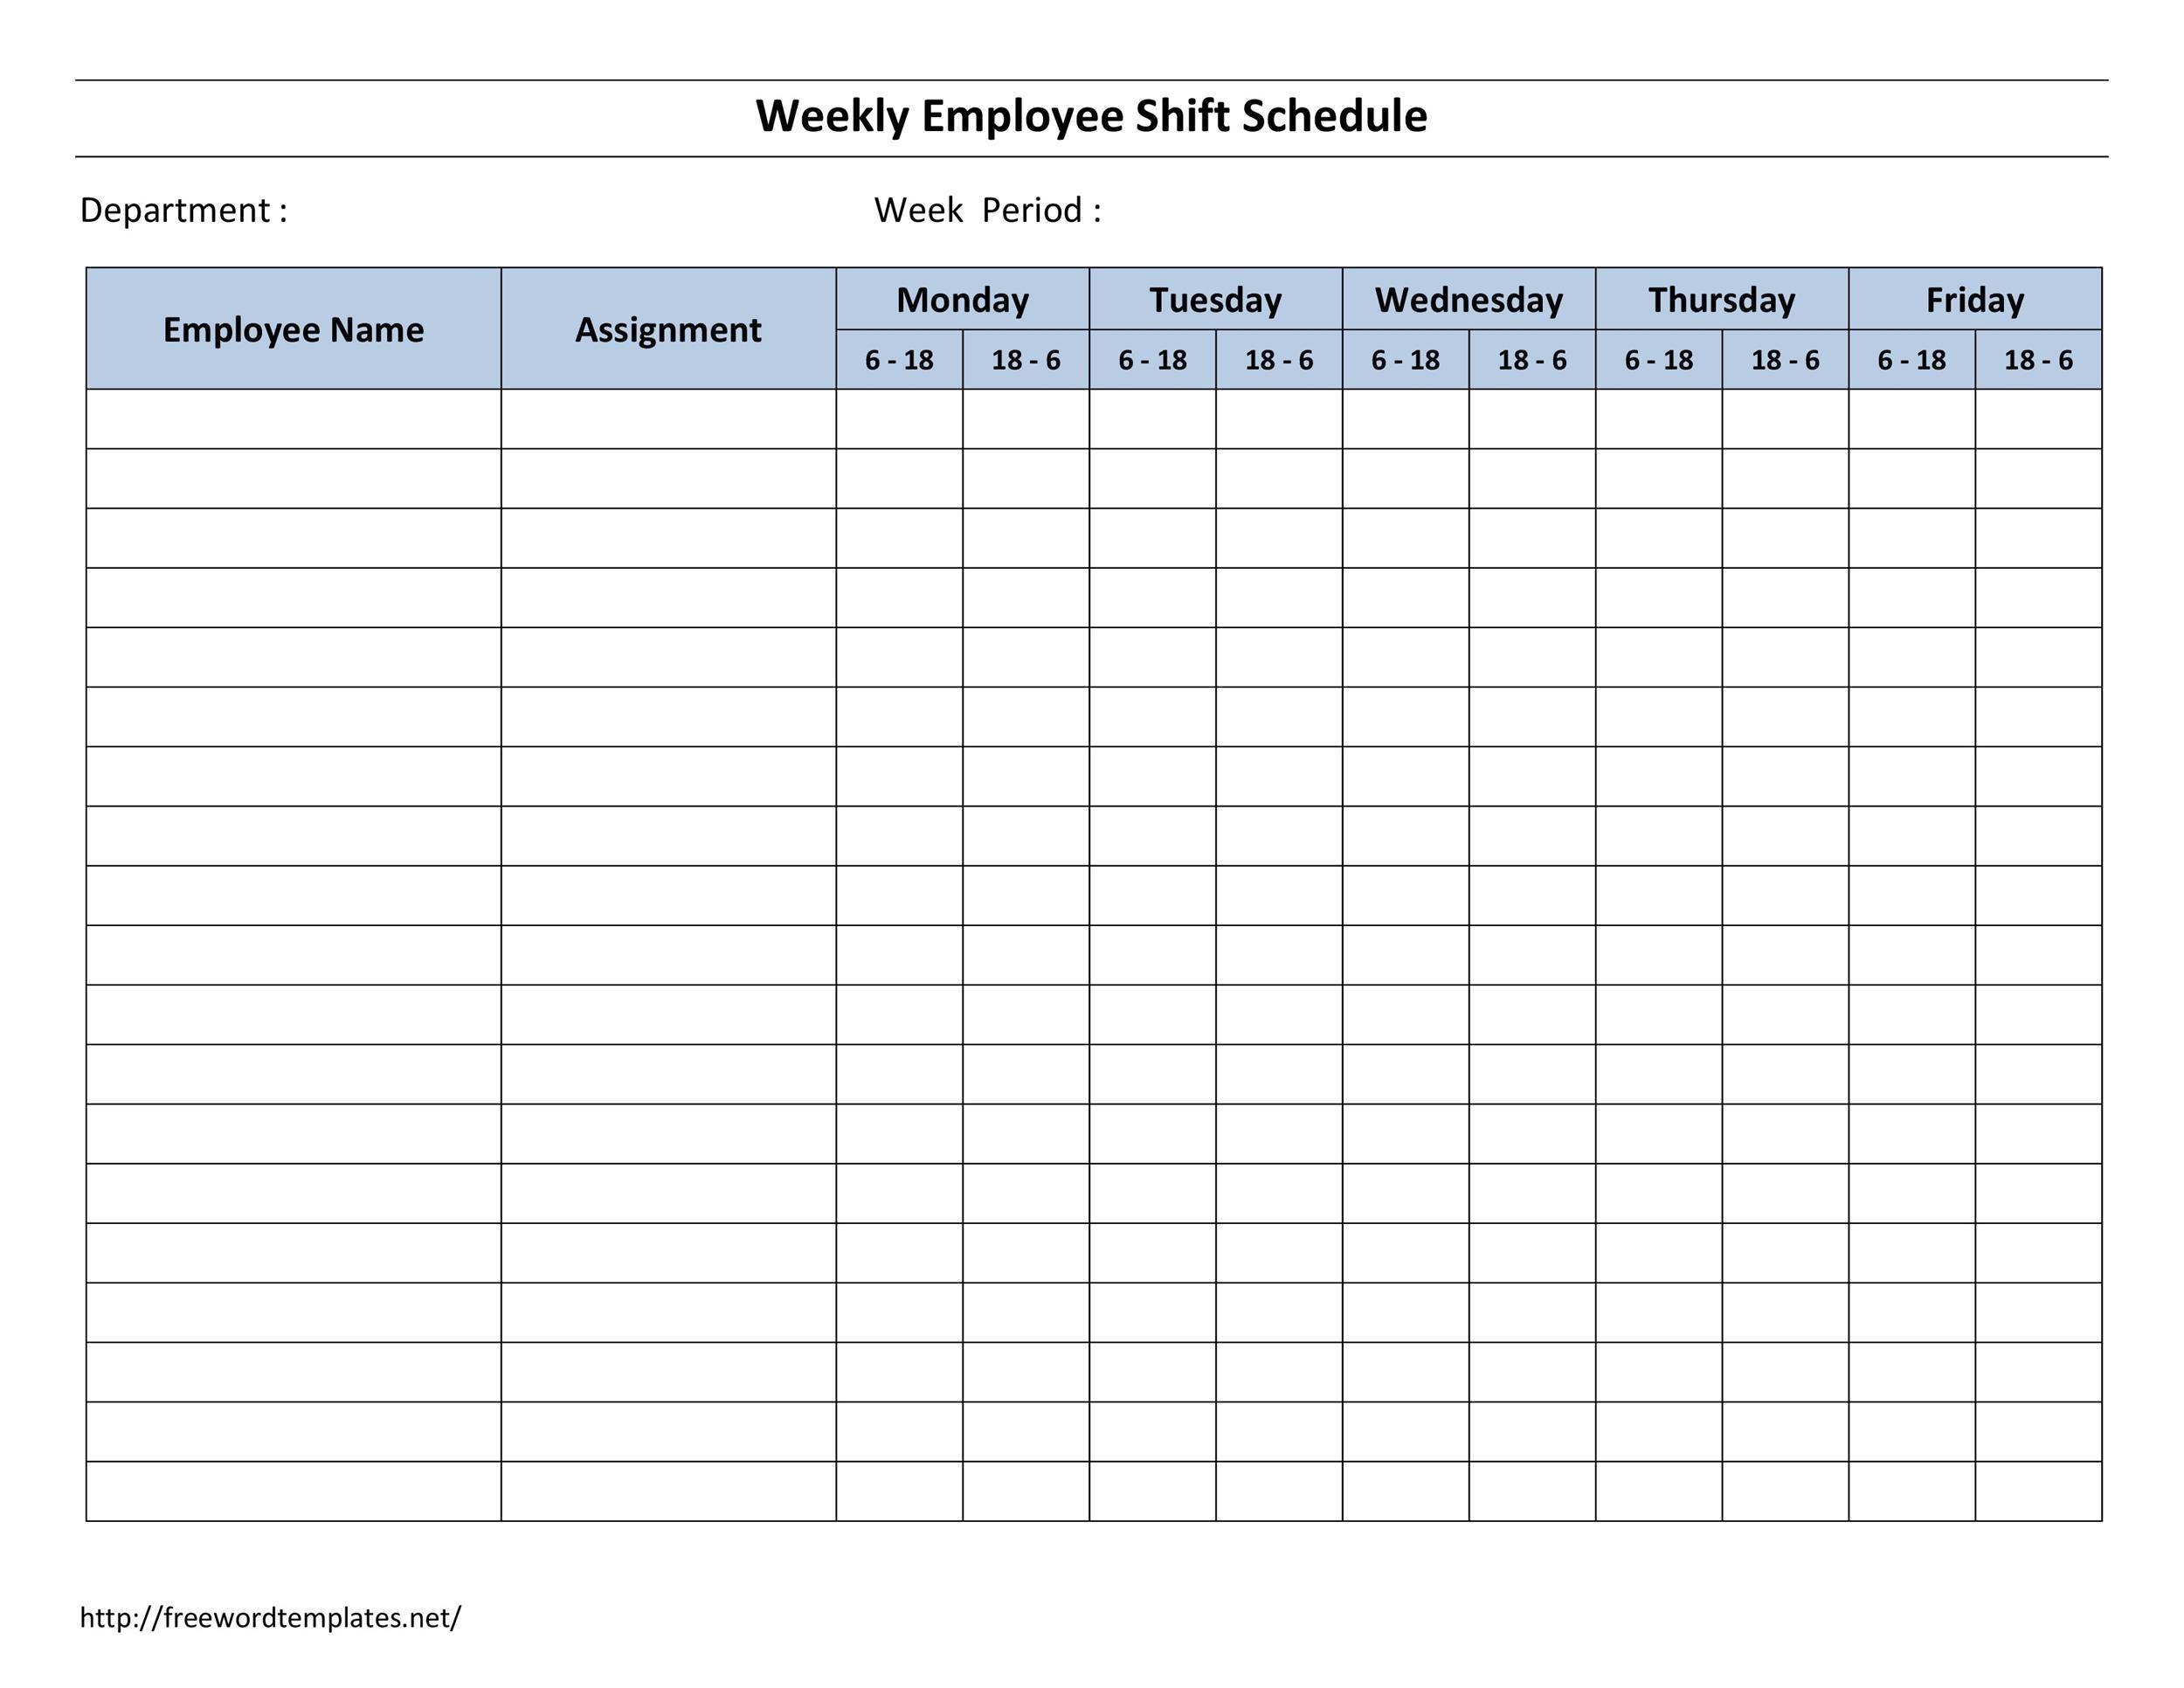 Take 12 Hour Shift Schedule Free